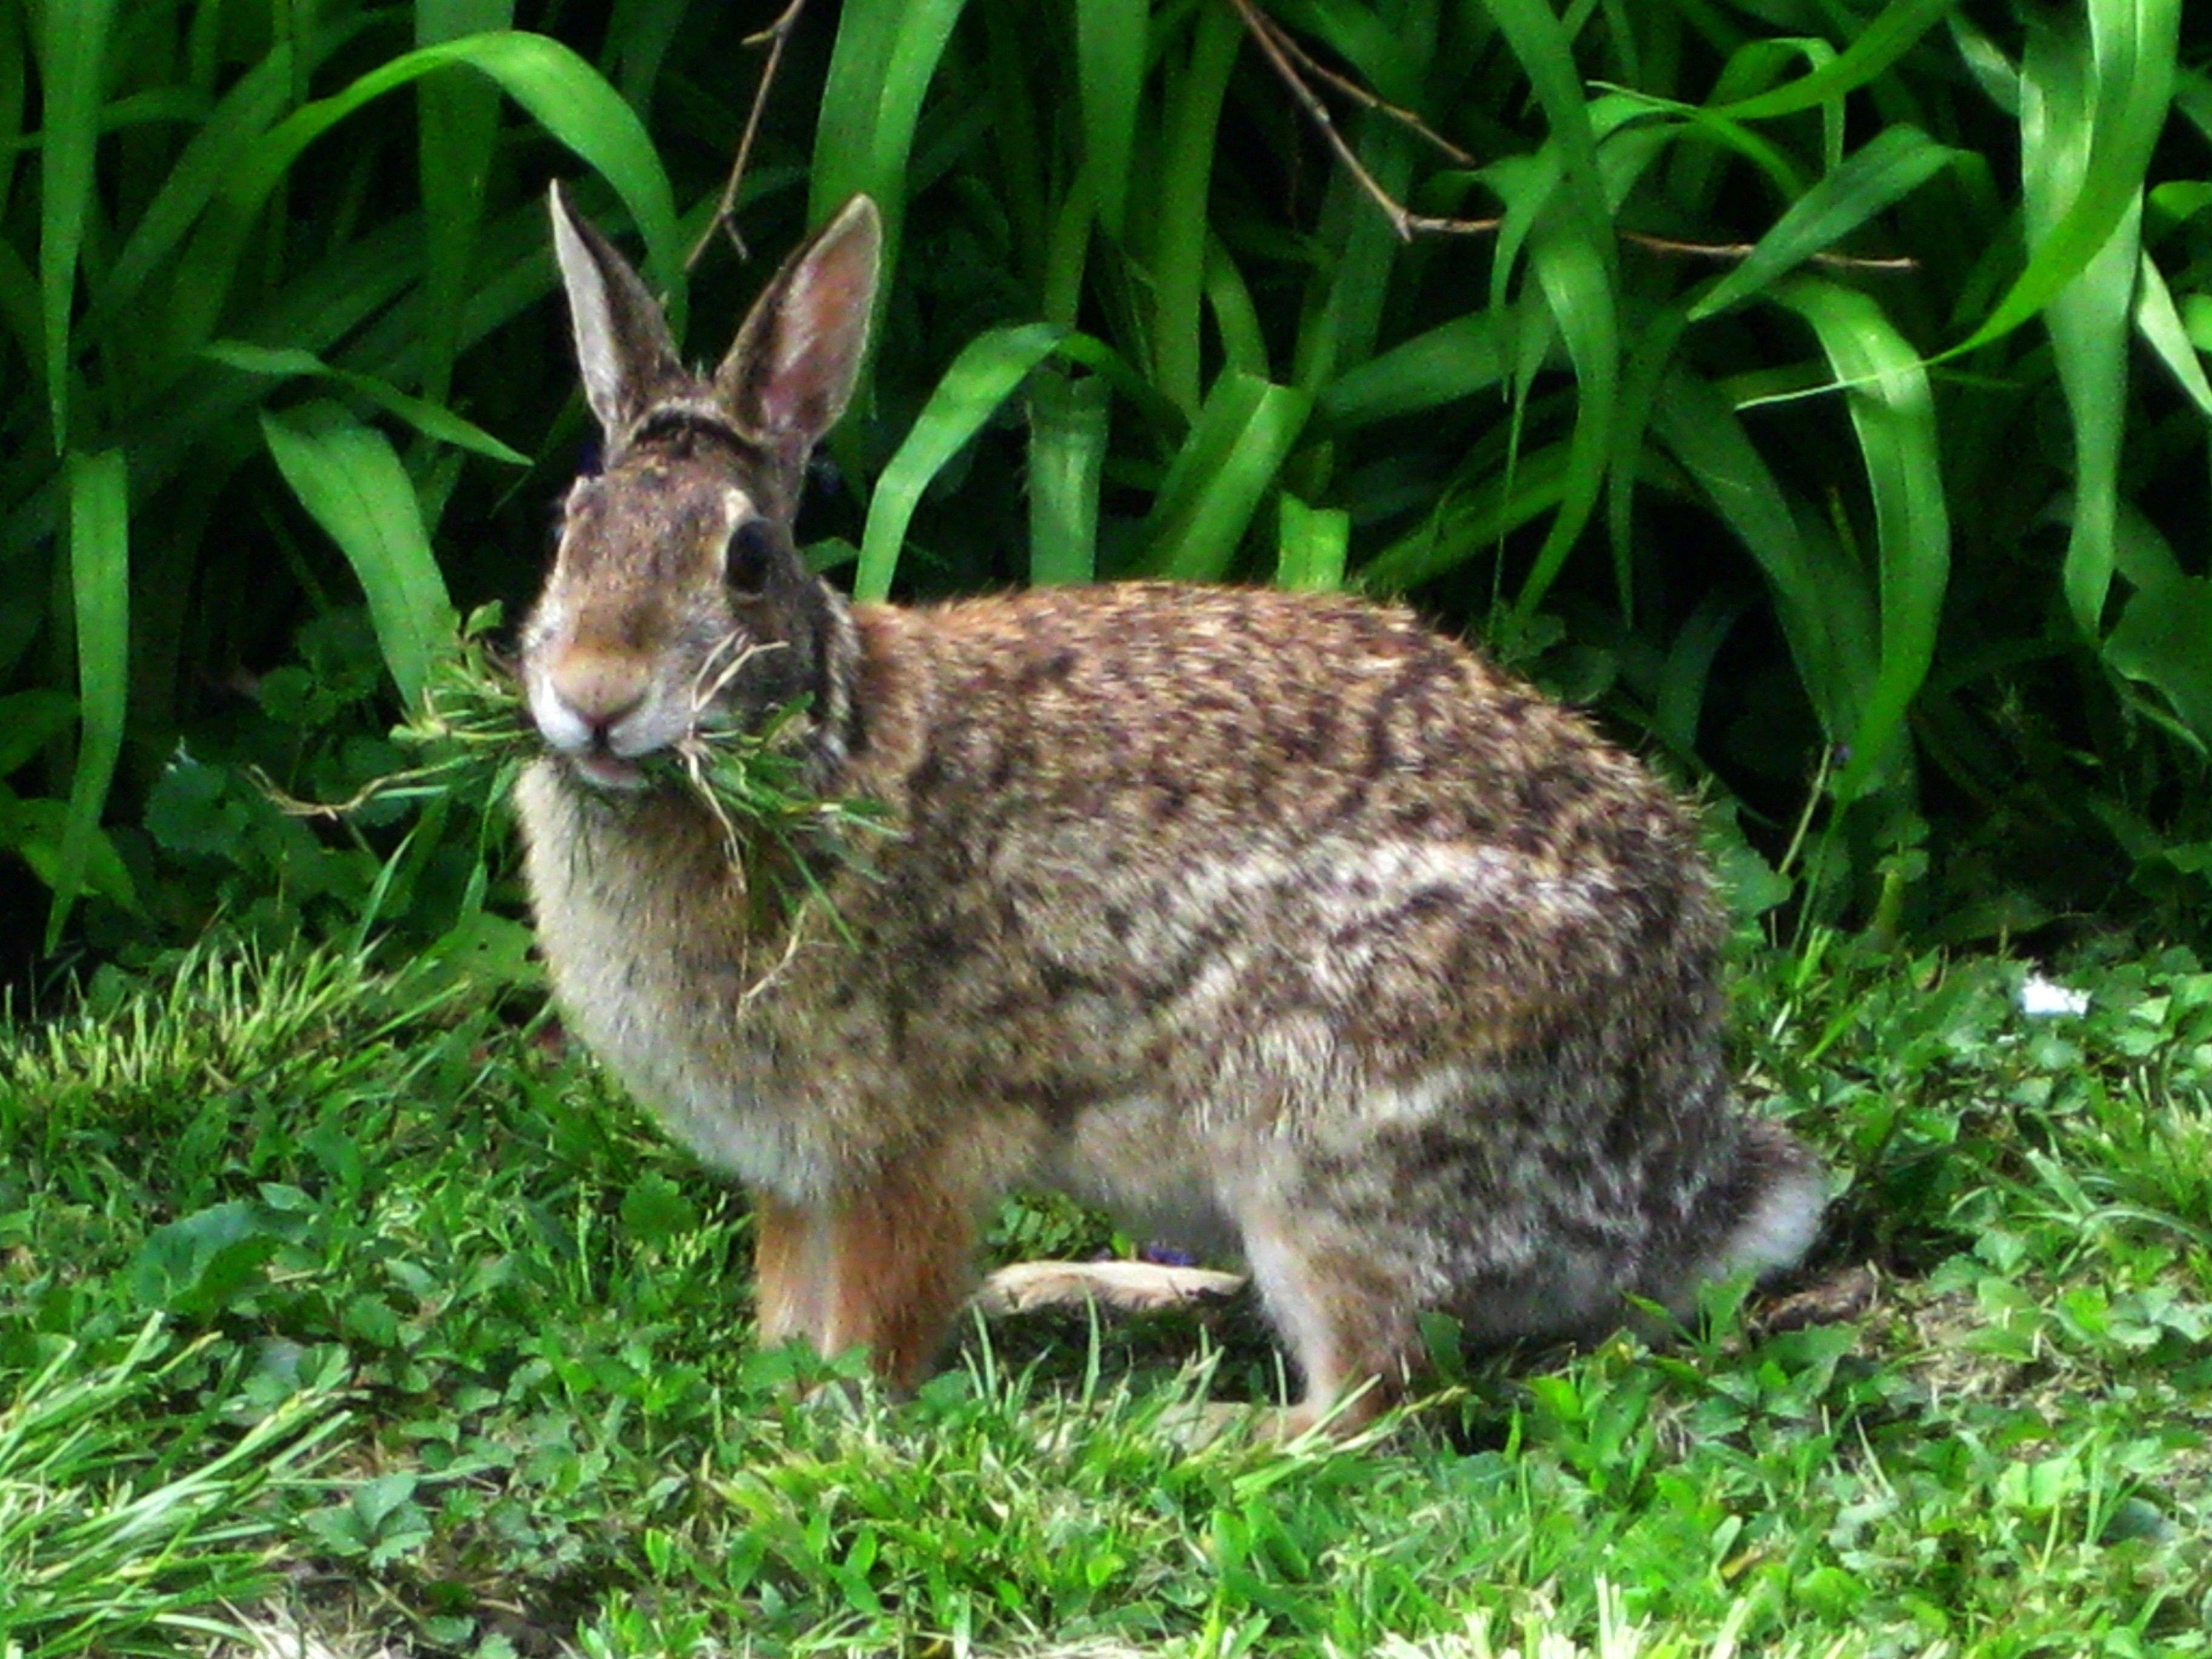 Rabbit Eating - Gray Rabbit Eating Grass Wallpaper